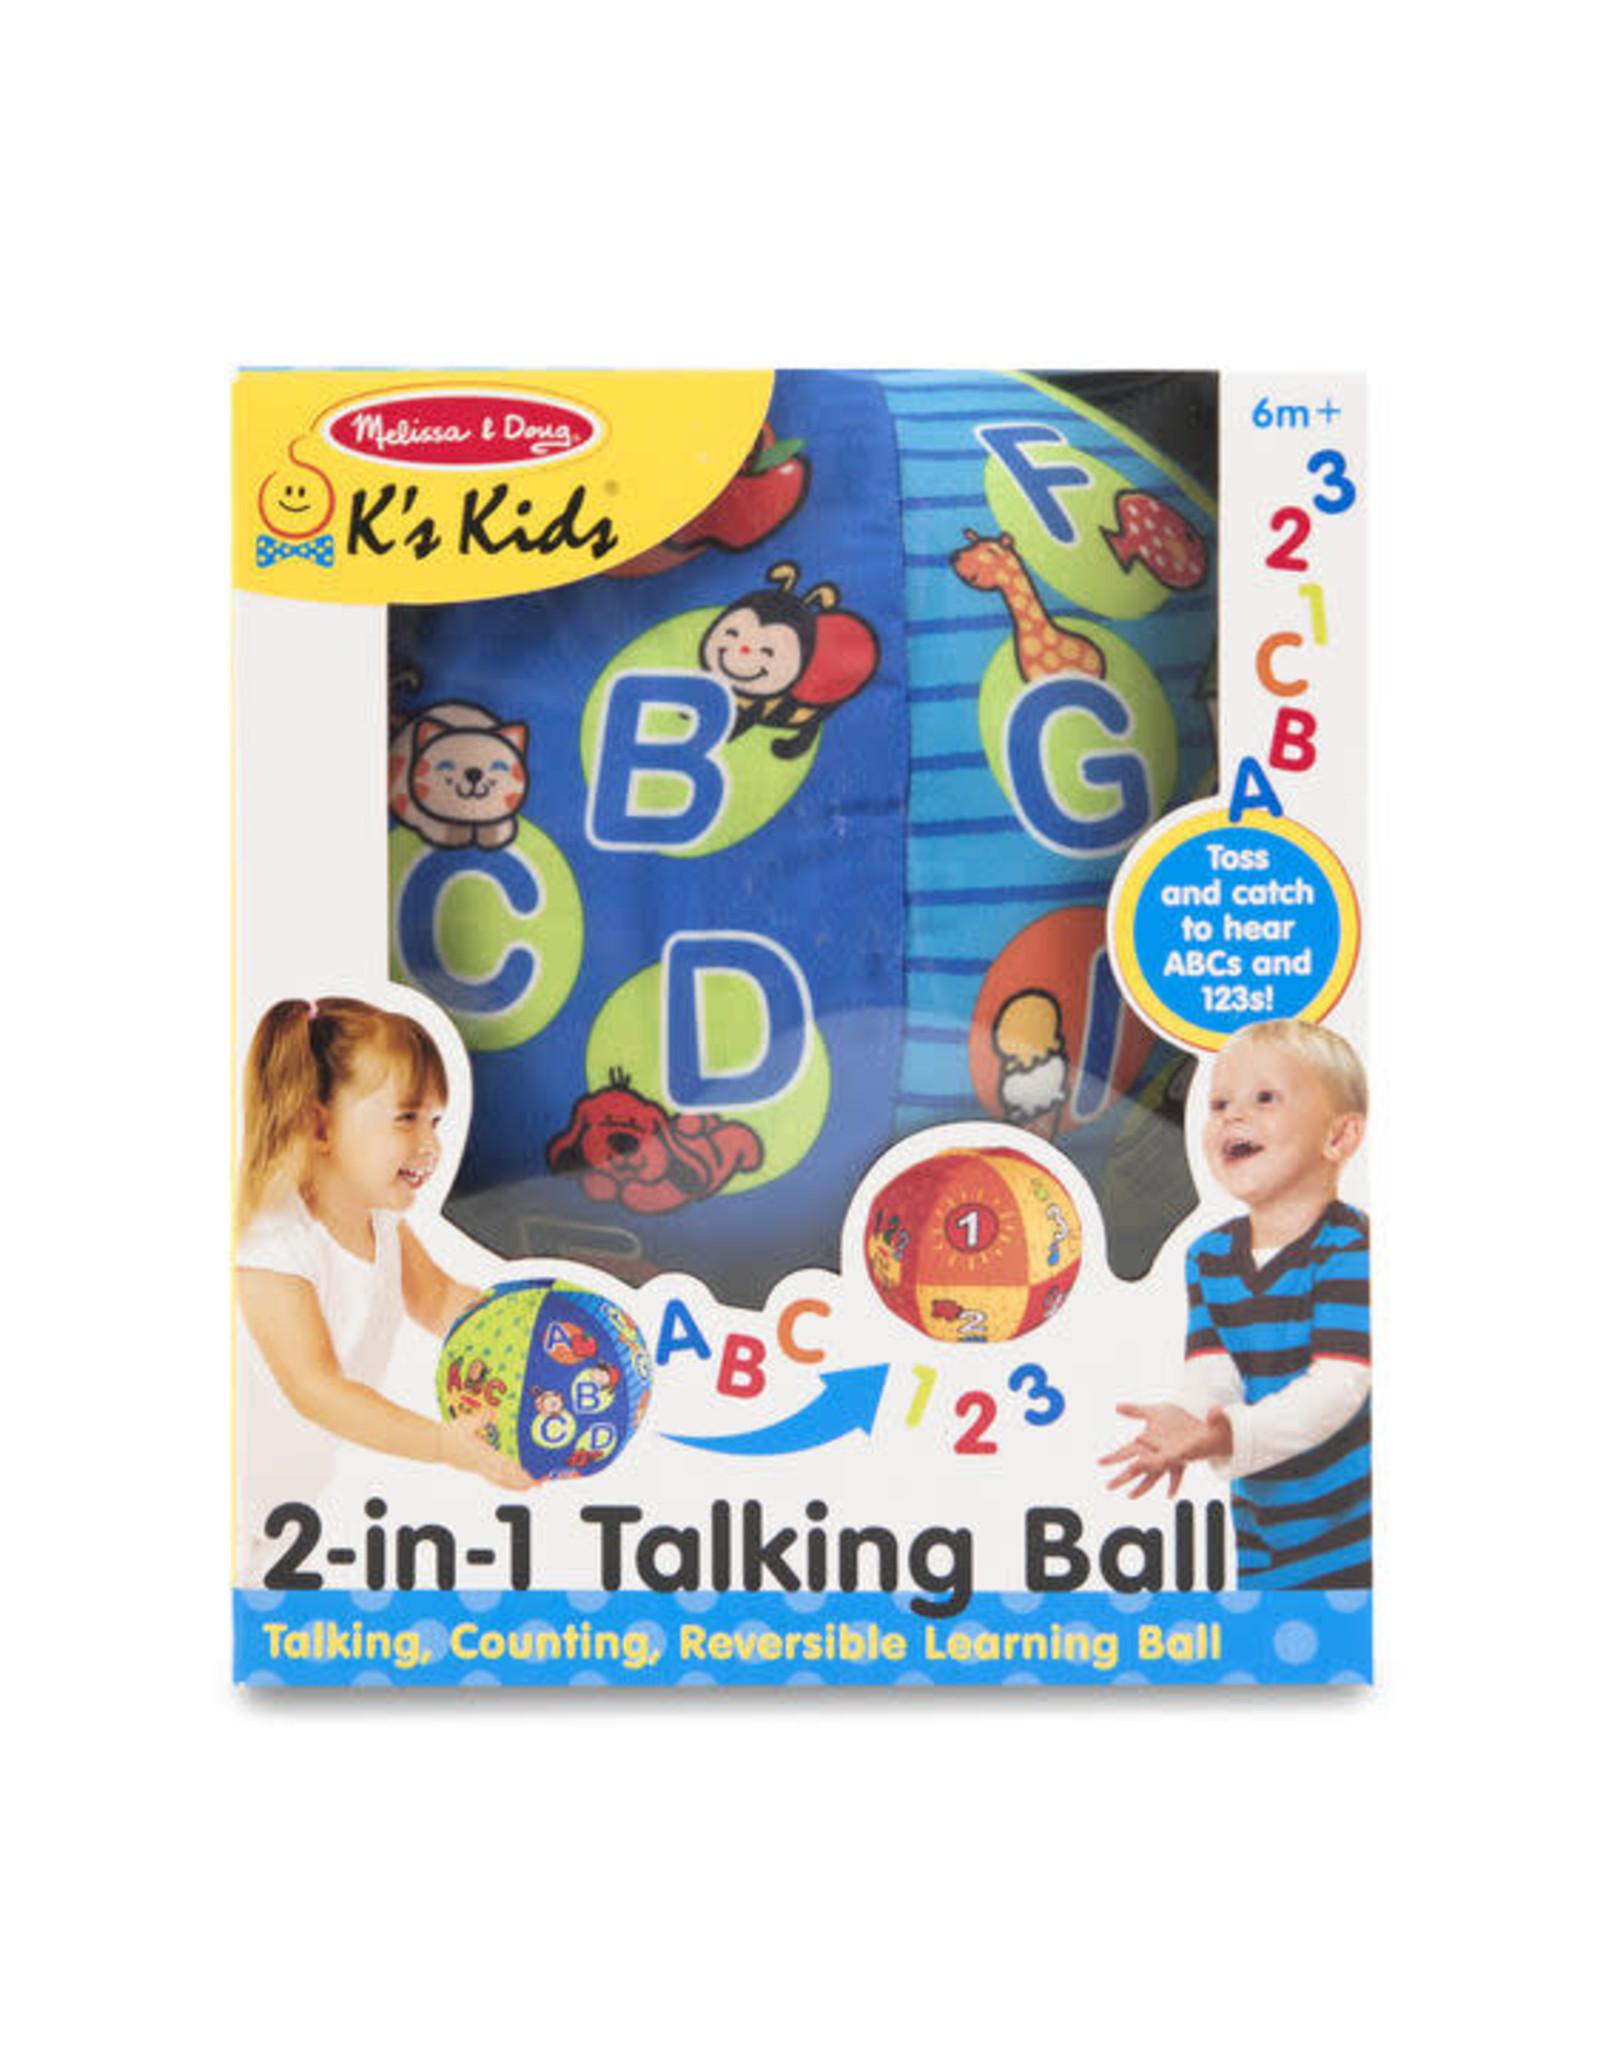 MELISSA & DOUG 2-in-1 Talking Ball